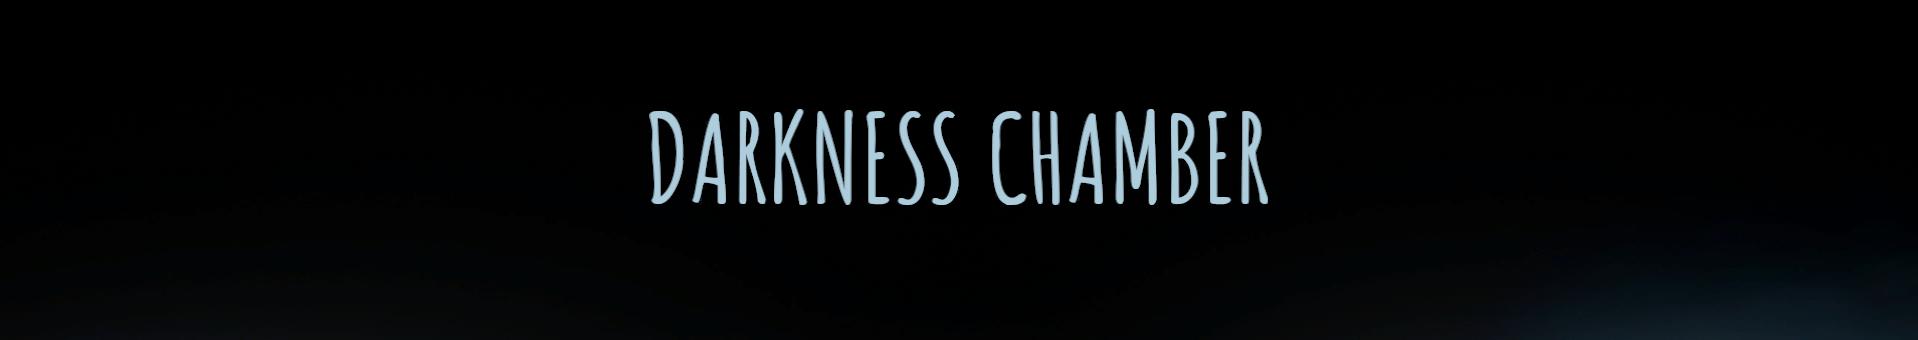 Darkness Chamber